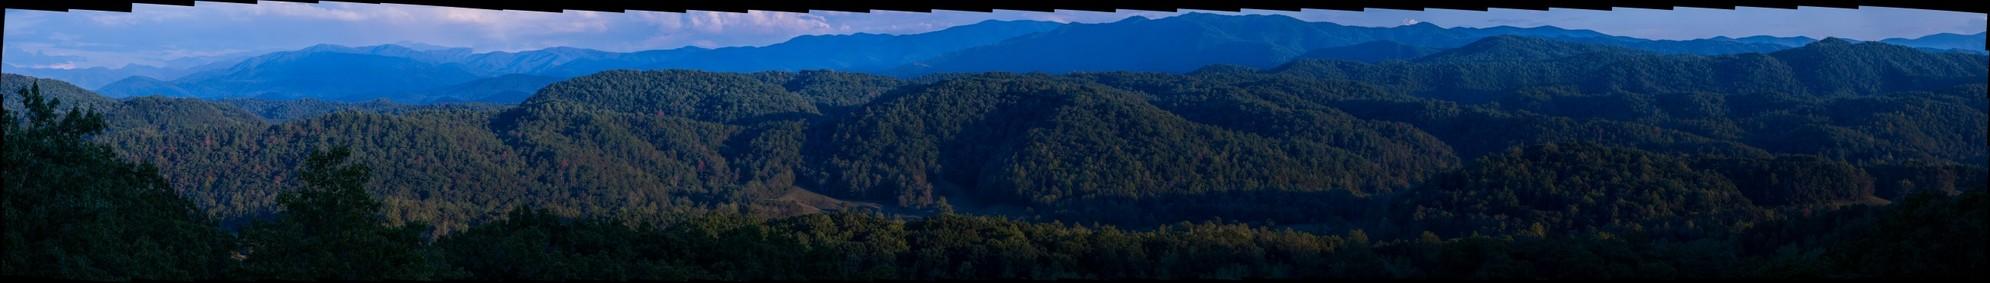 Sept 25th 2016 - Smokey Mountain Foothills